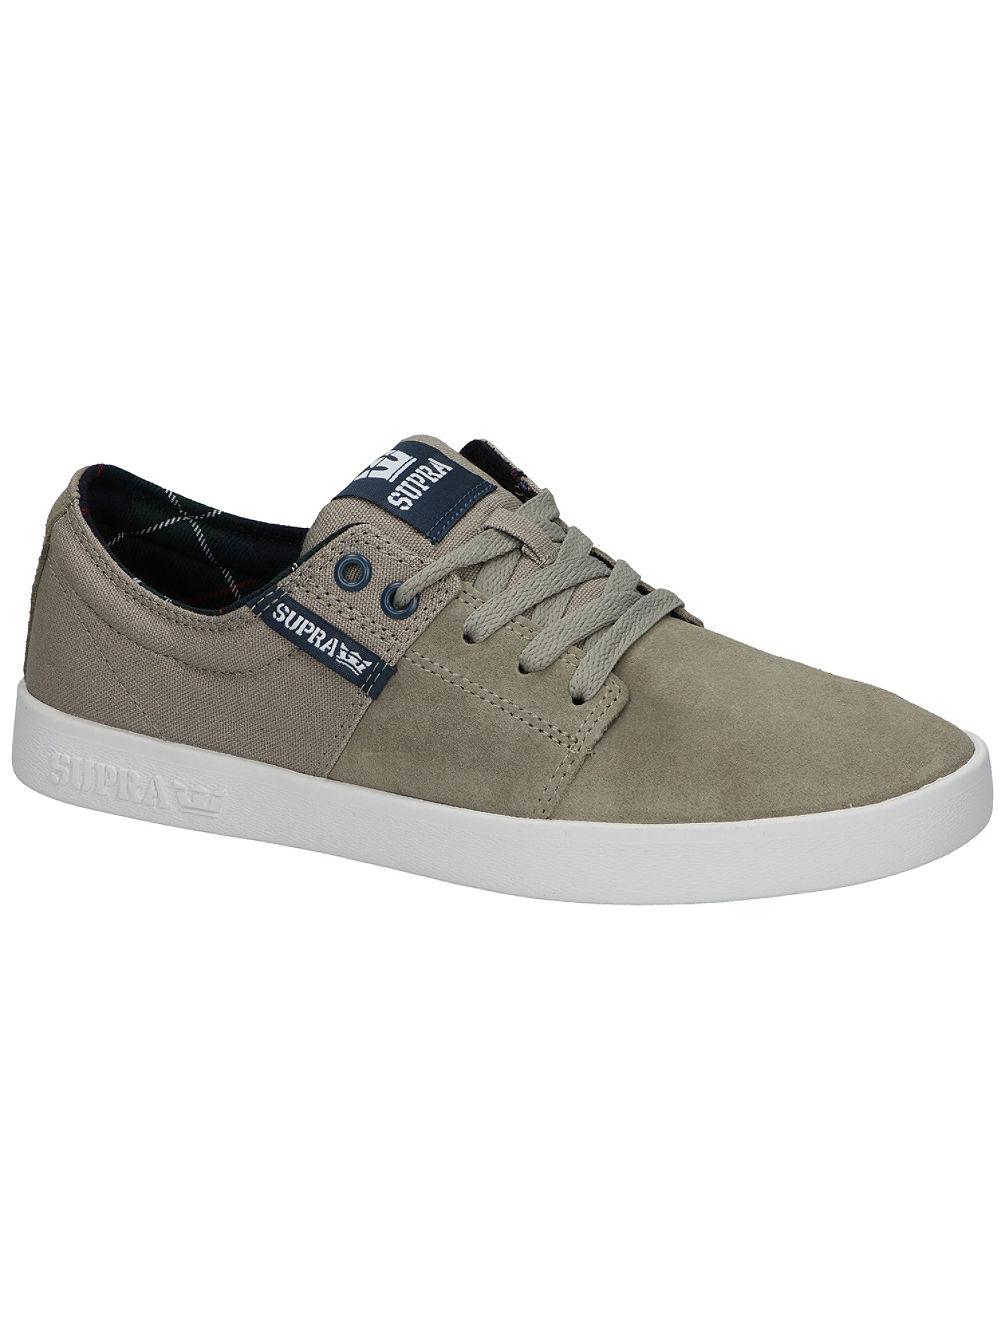 29bf6cba0e2c Buy Supra Stacks II Skate Shoes online at Blue Tomato